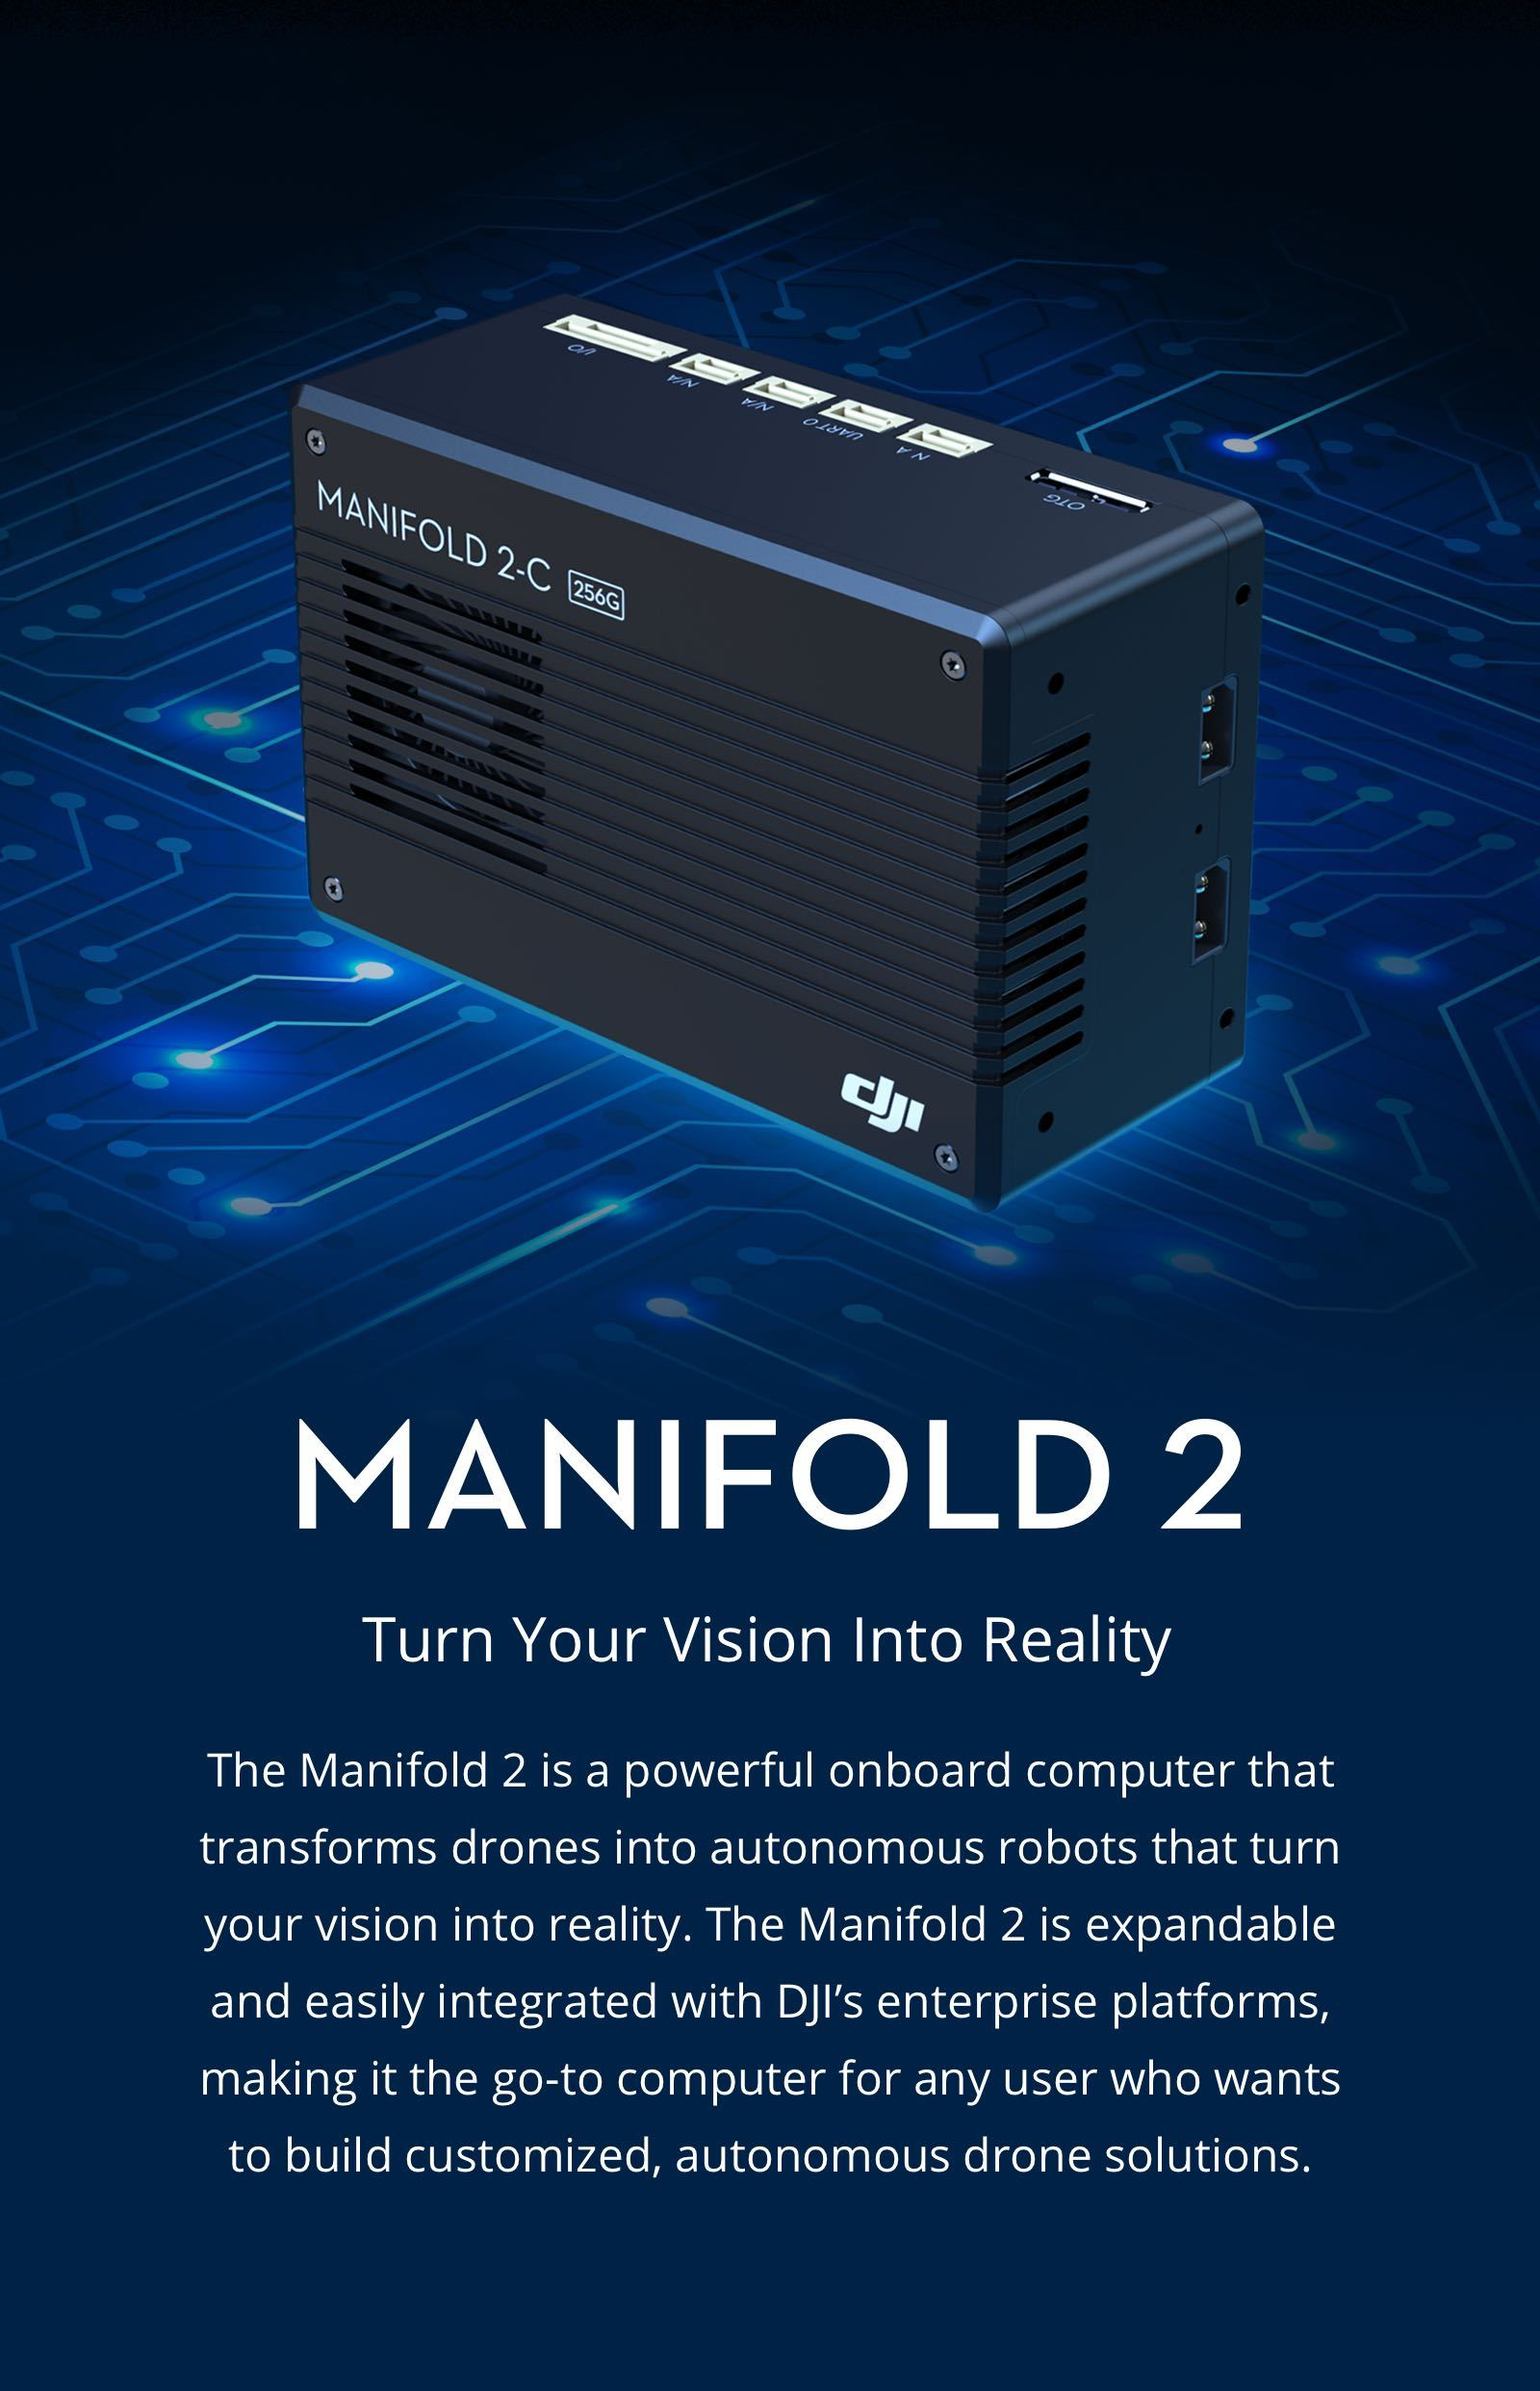 Mainfold_2_stockrc